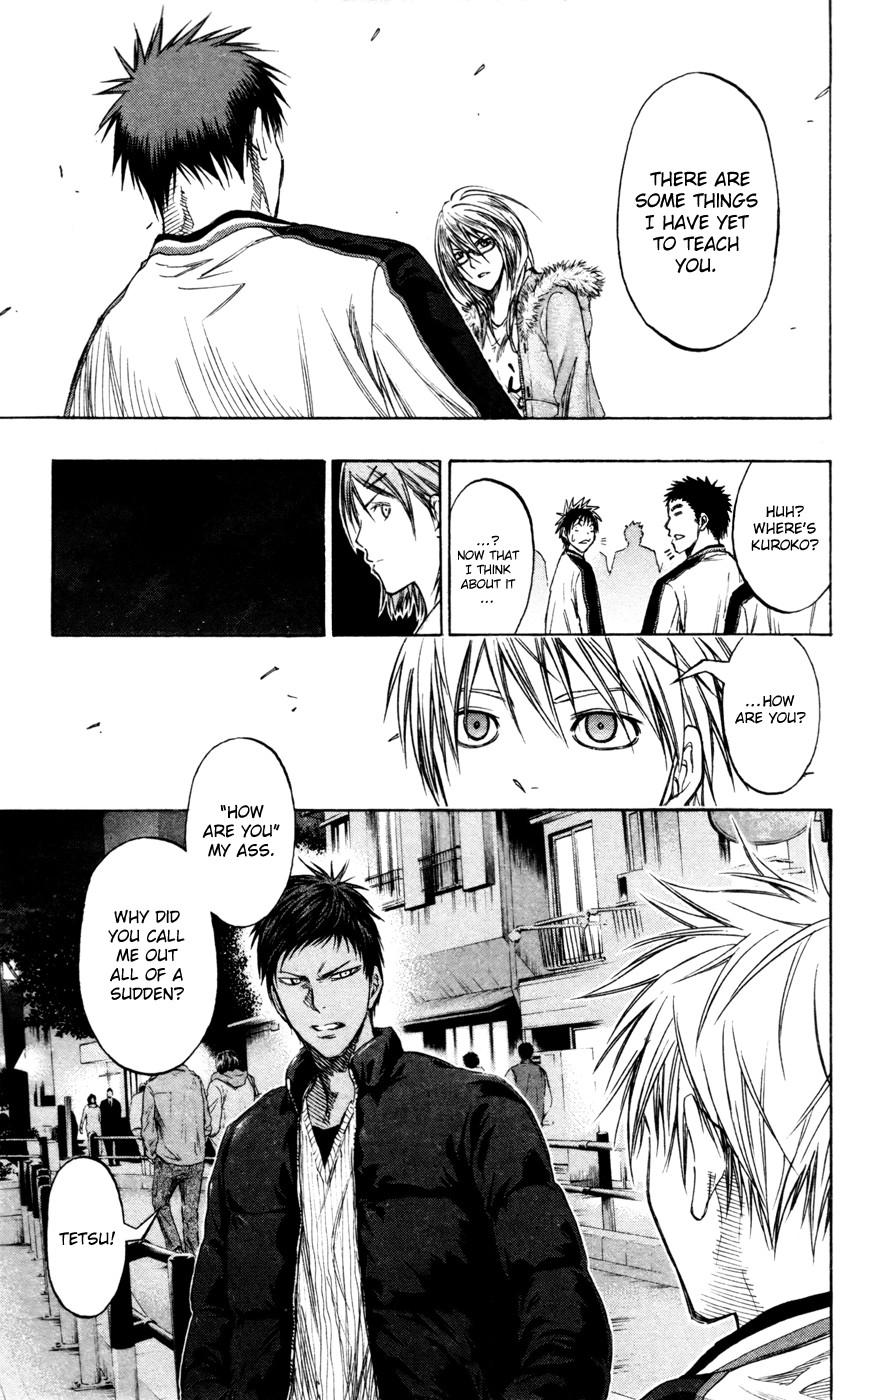 Kuroko no Basket Manga Chapter 141 - Image 19